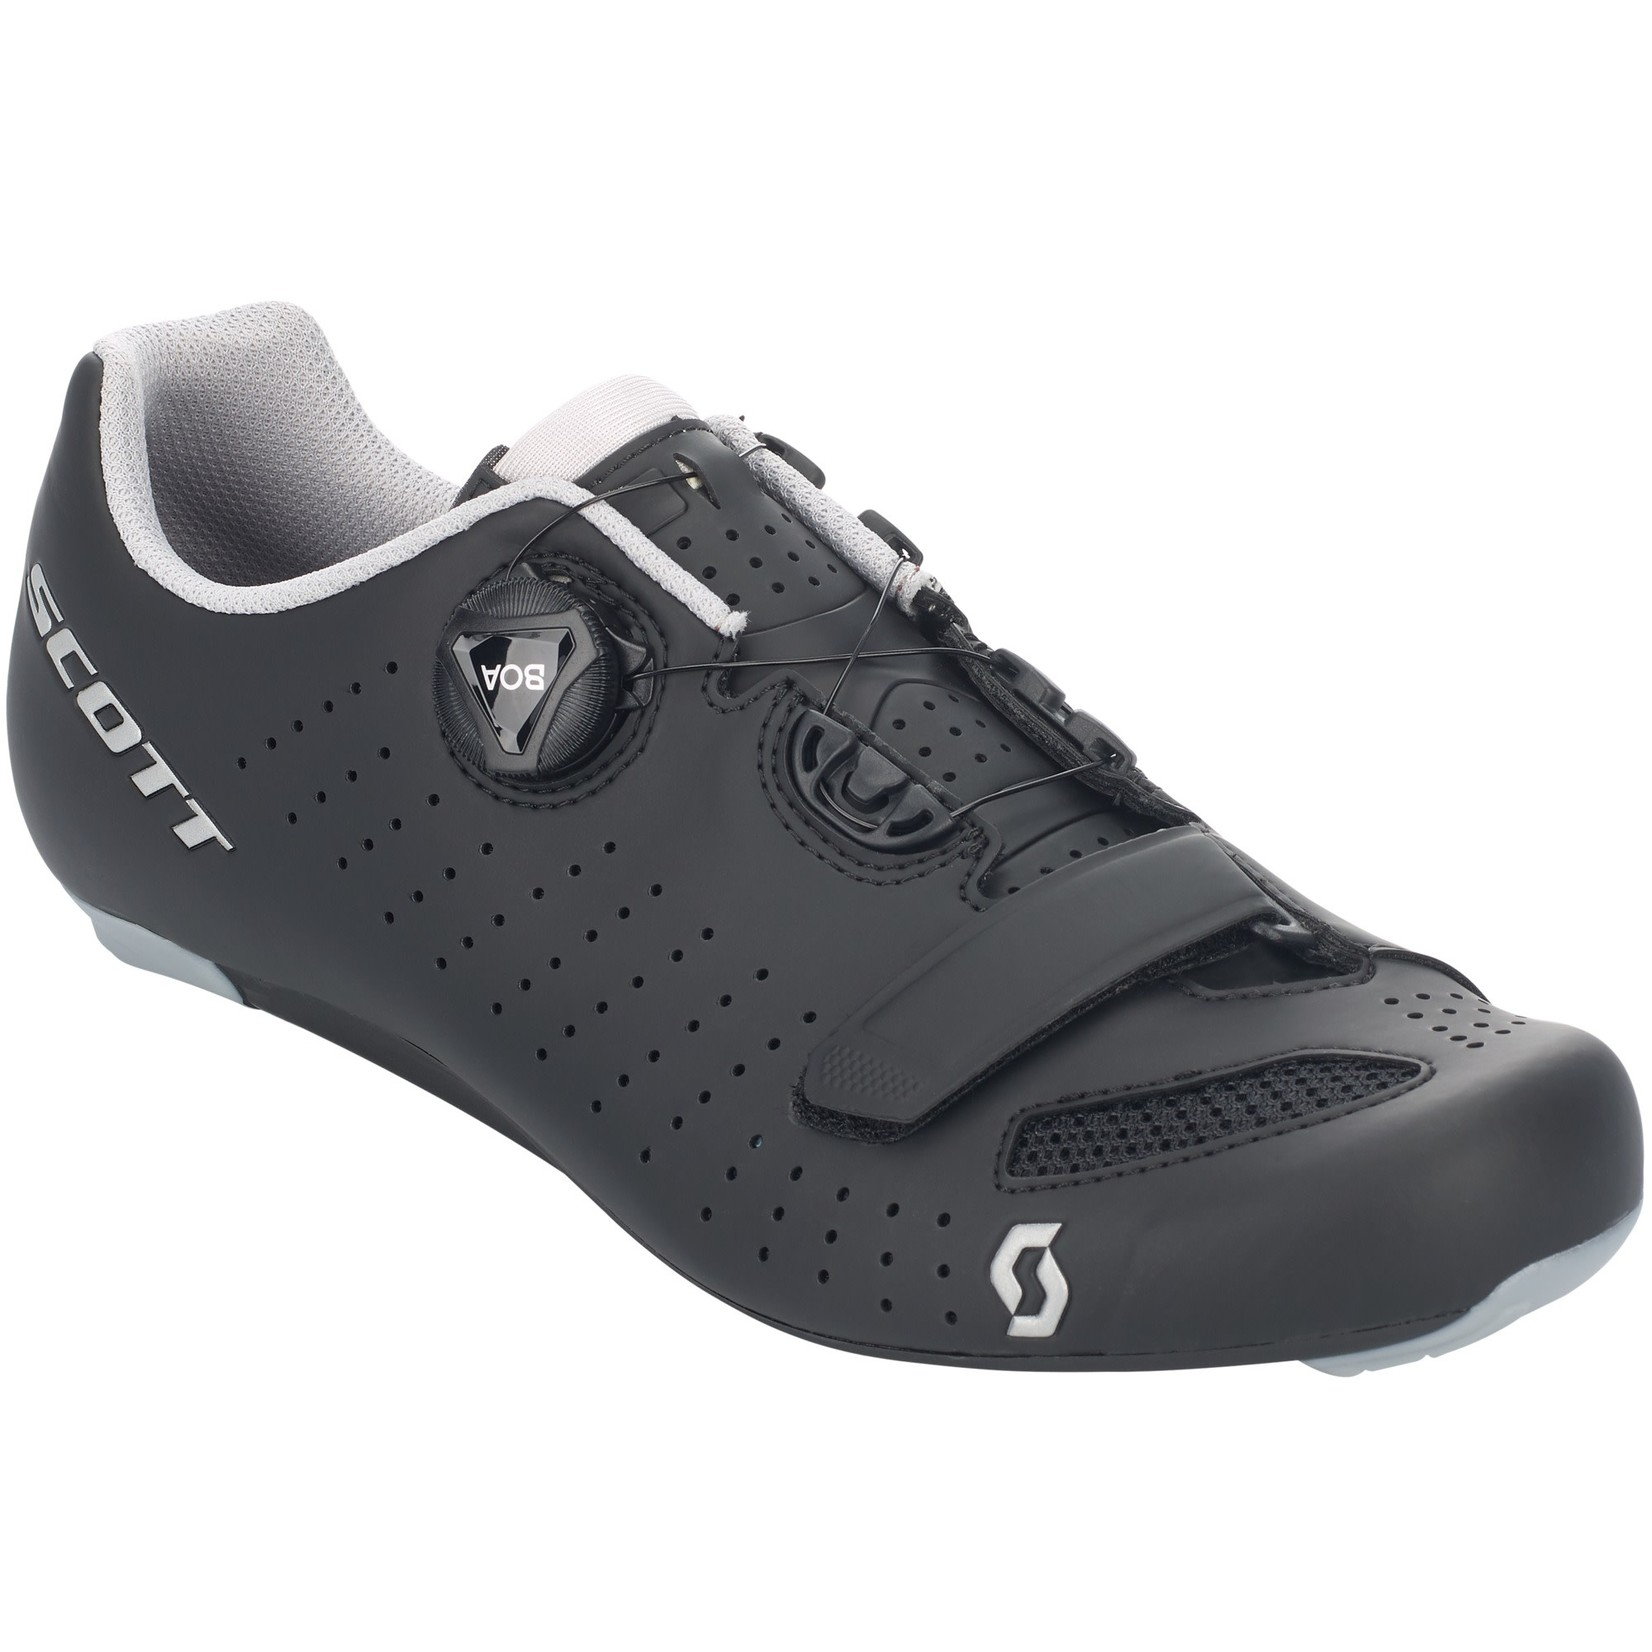 Scott SCOTT ROAD COMP BOA® SHOE Black/silver